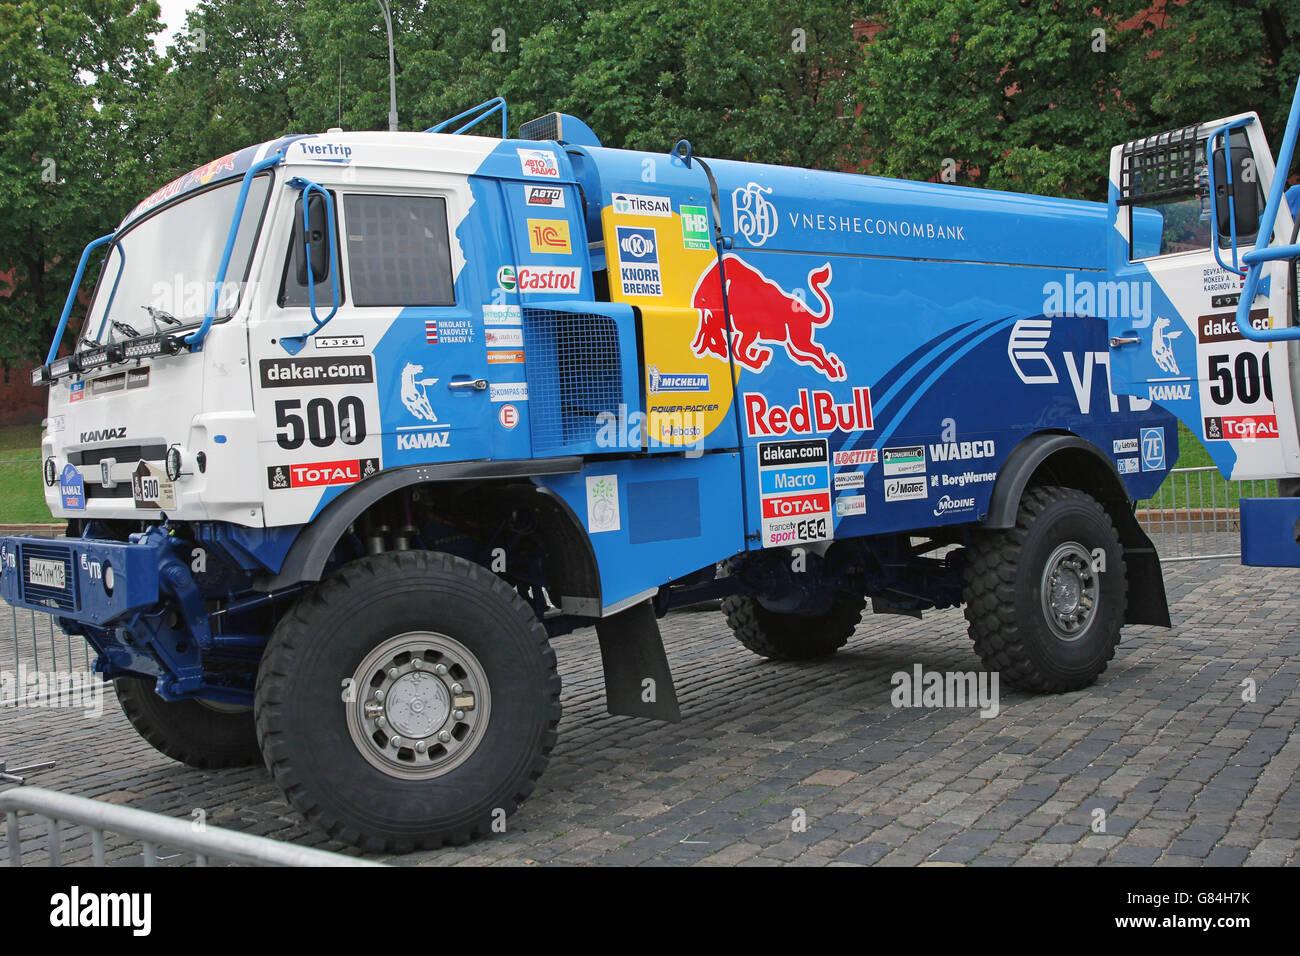 Hood KAMAZ - sports modification for participation in rally Paris - Dakar